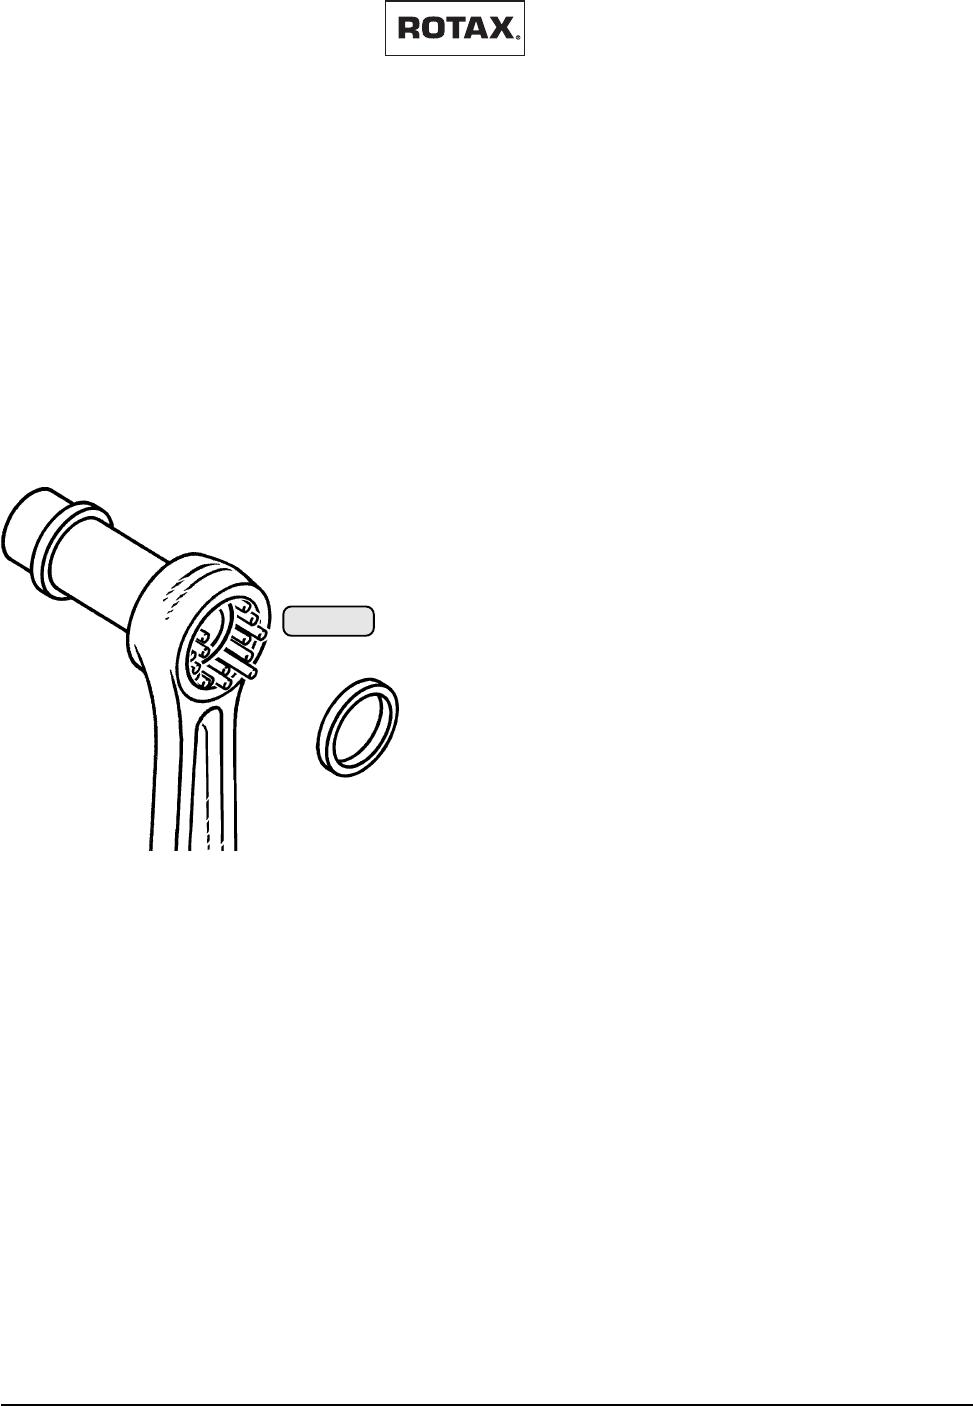 Mm 447 503 582 D00370 D00288 Rotax Wiring Diagram Effectivity Ul Scdi Dcdi Mod 99